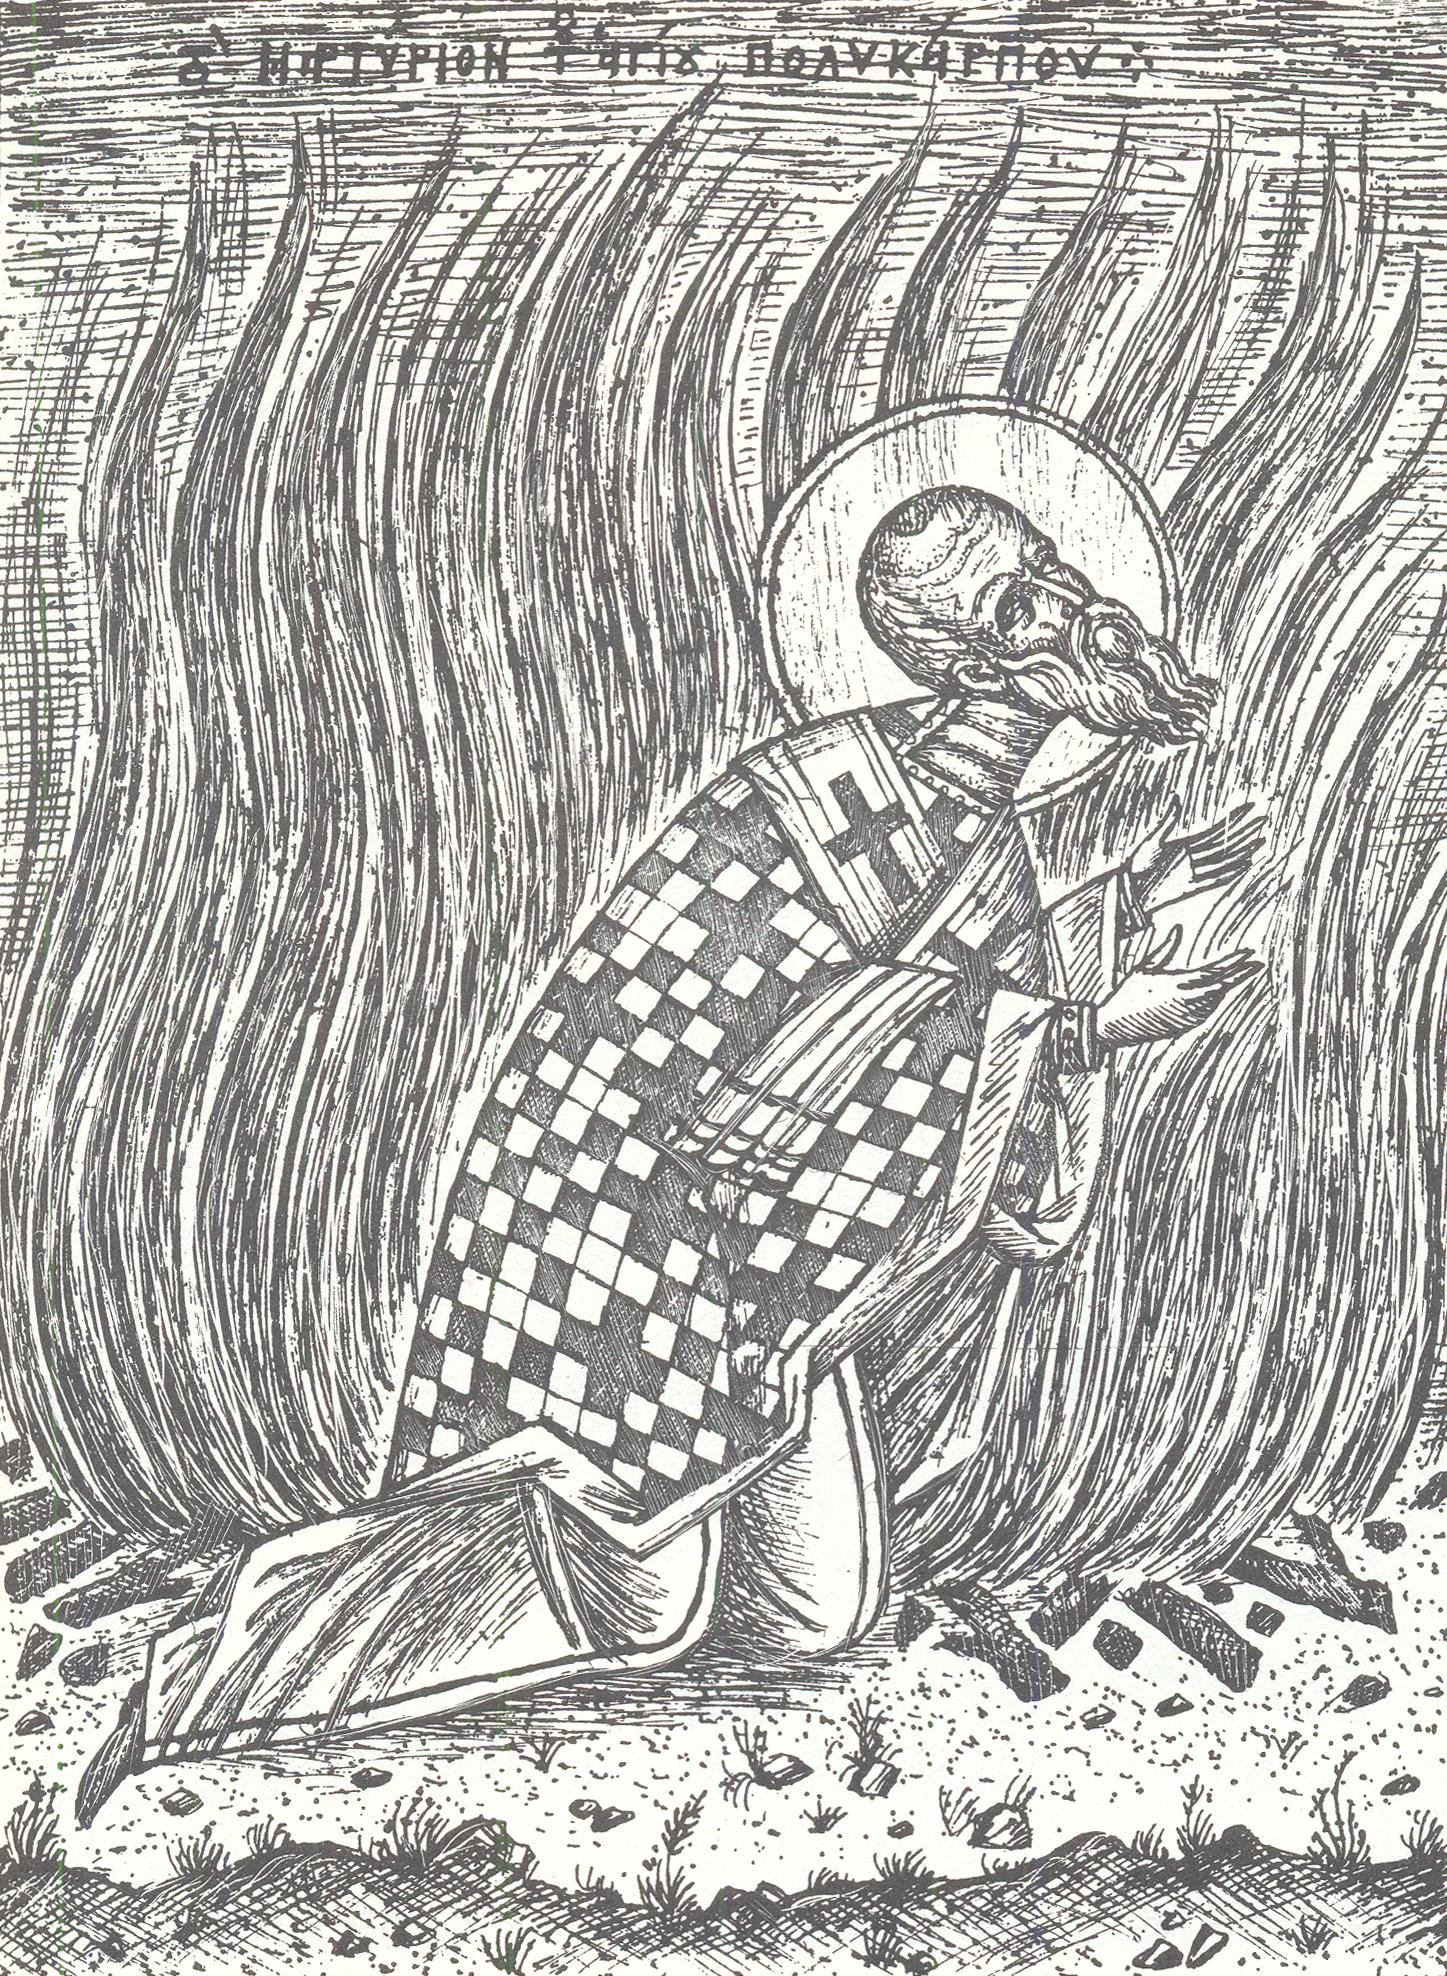 http://vatopaidi.files.wordpress.com/2010/02/the-martyrdom-of-st-polycarp.jpg